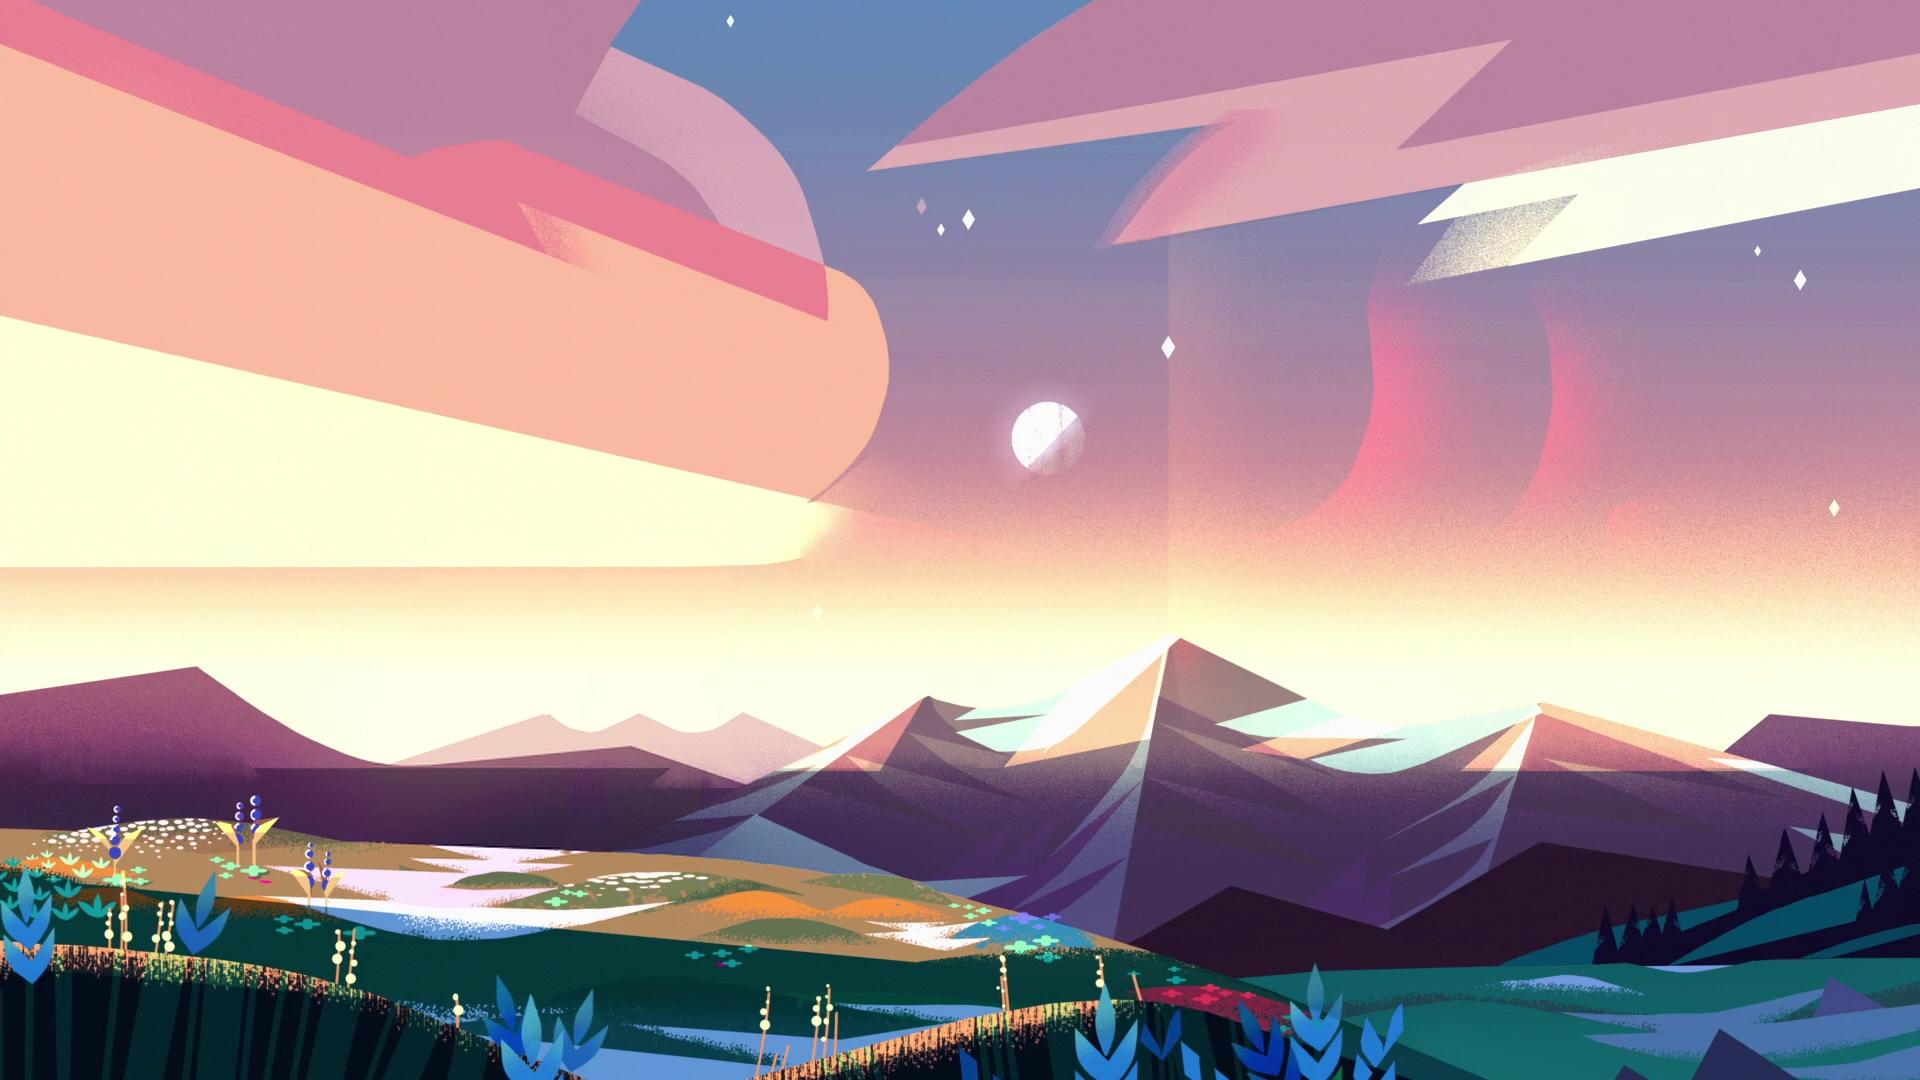 10 Best Hd Steven Universe Wallpaper FULL HD 1920×1080 For PC Background